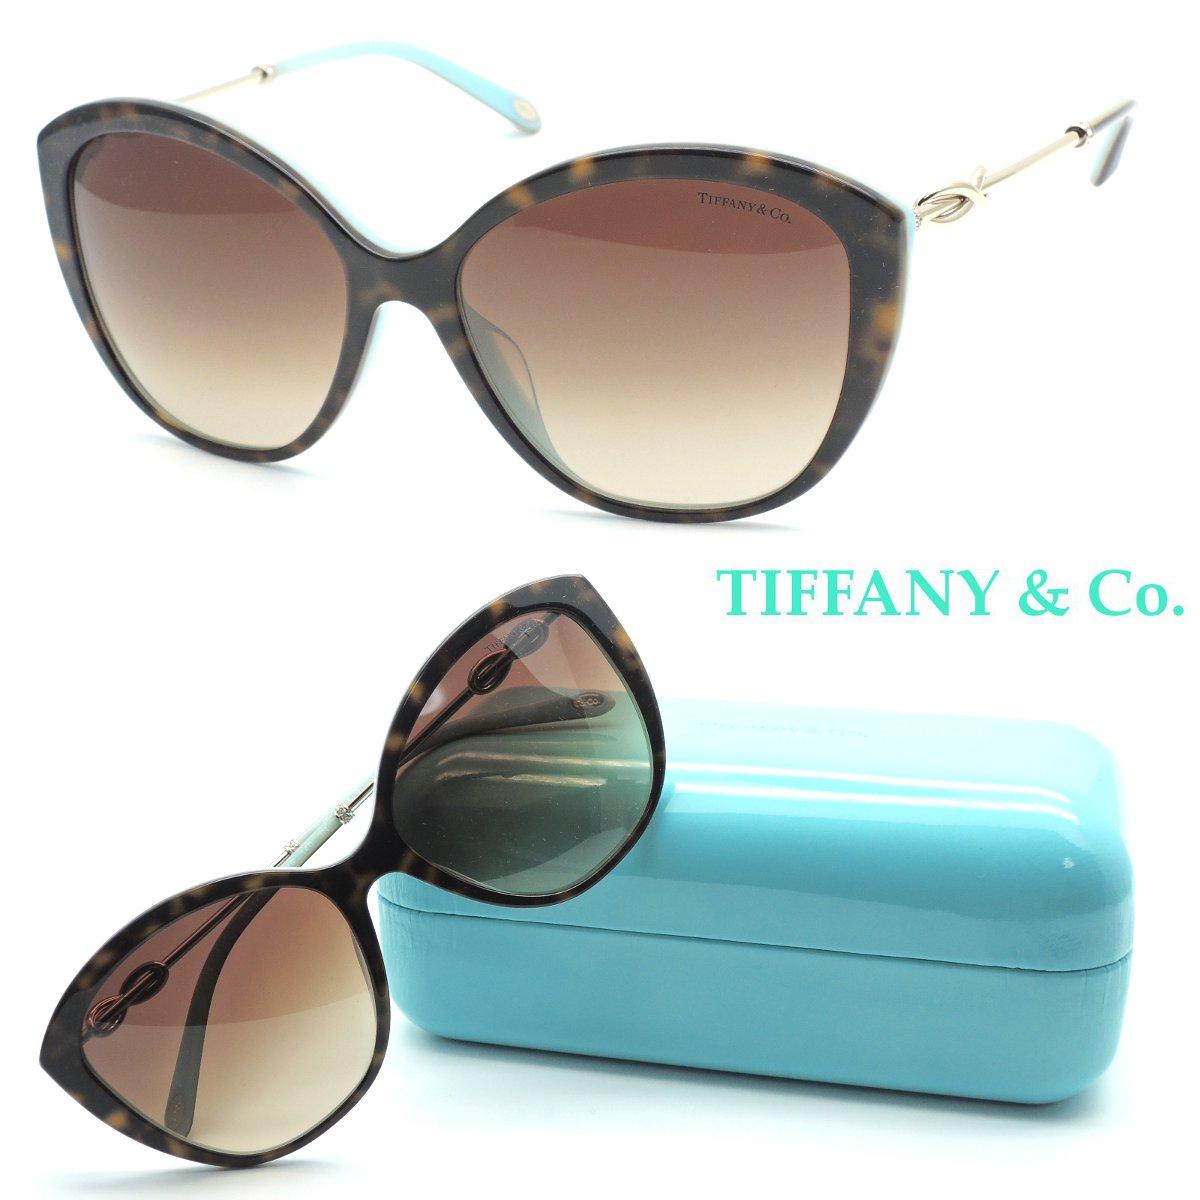 【TIFFANY&Co.】ティファニー サングラス TF4144-B-F col.8134/3B【正規代理店品】【店内全品送料無料】高級 レディース